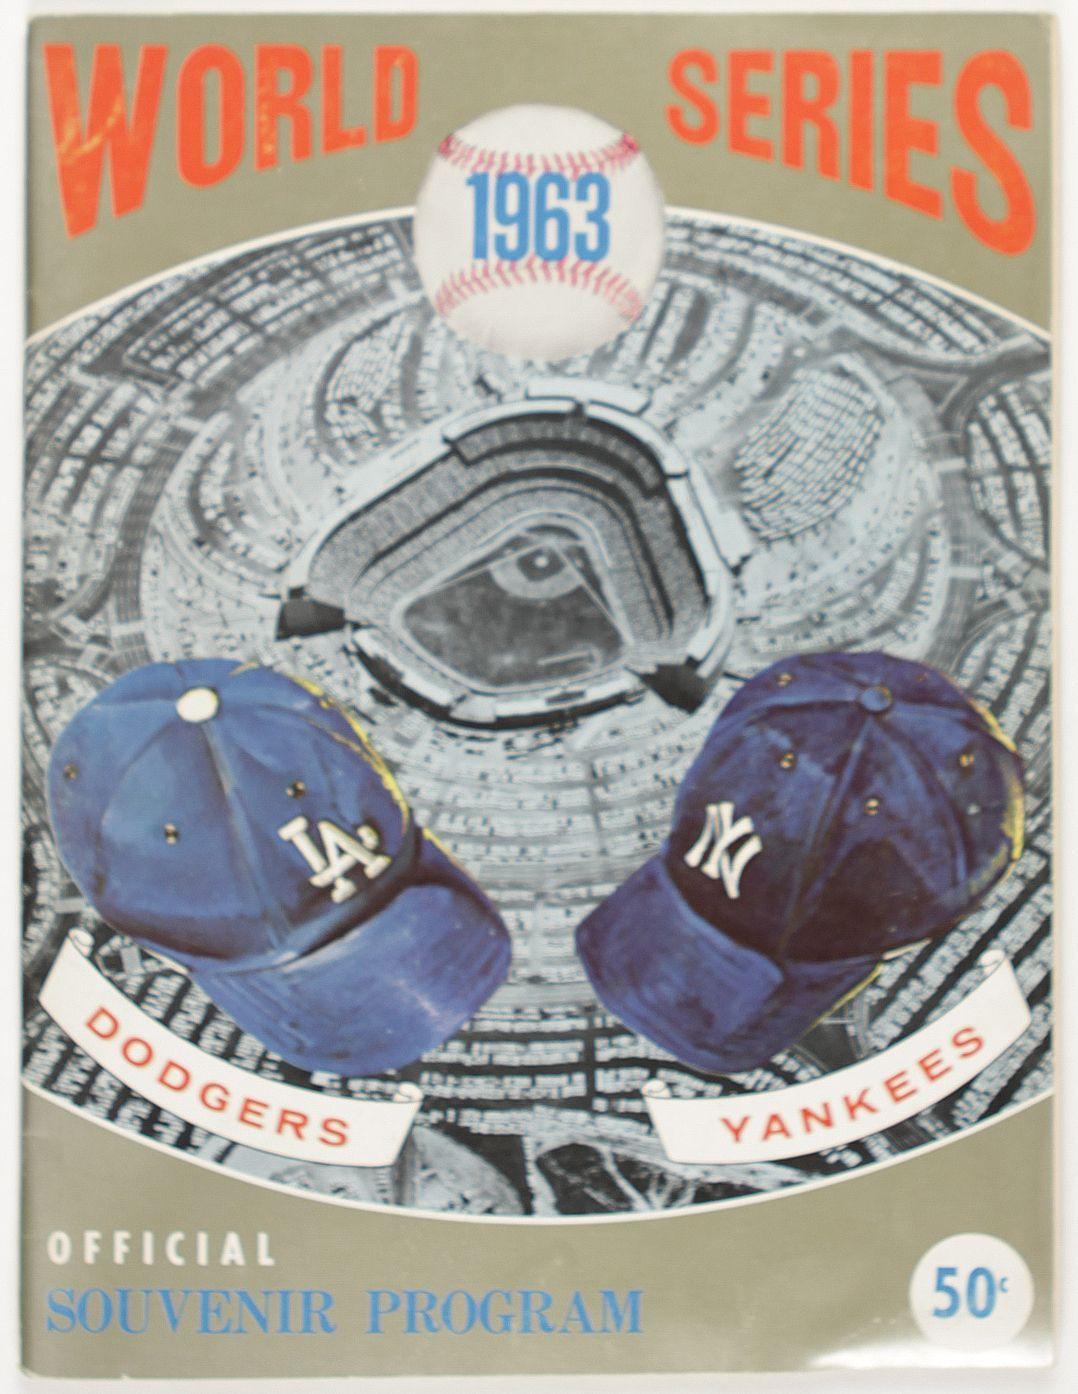 1963 Los Angeles Dodgers 4 New York Yankees 0 Dodgers 1963 World Series World Series